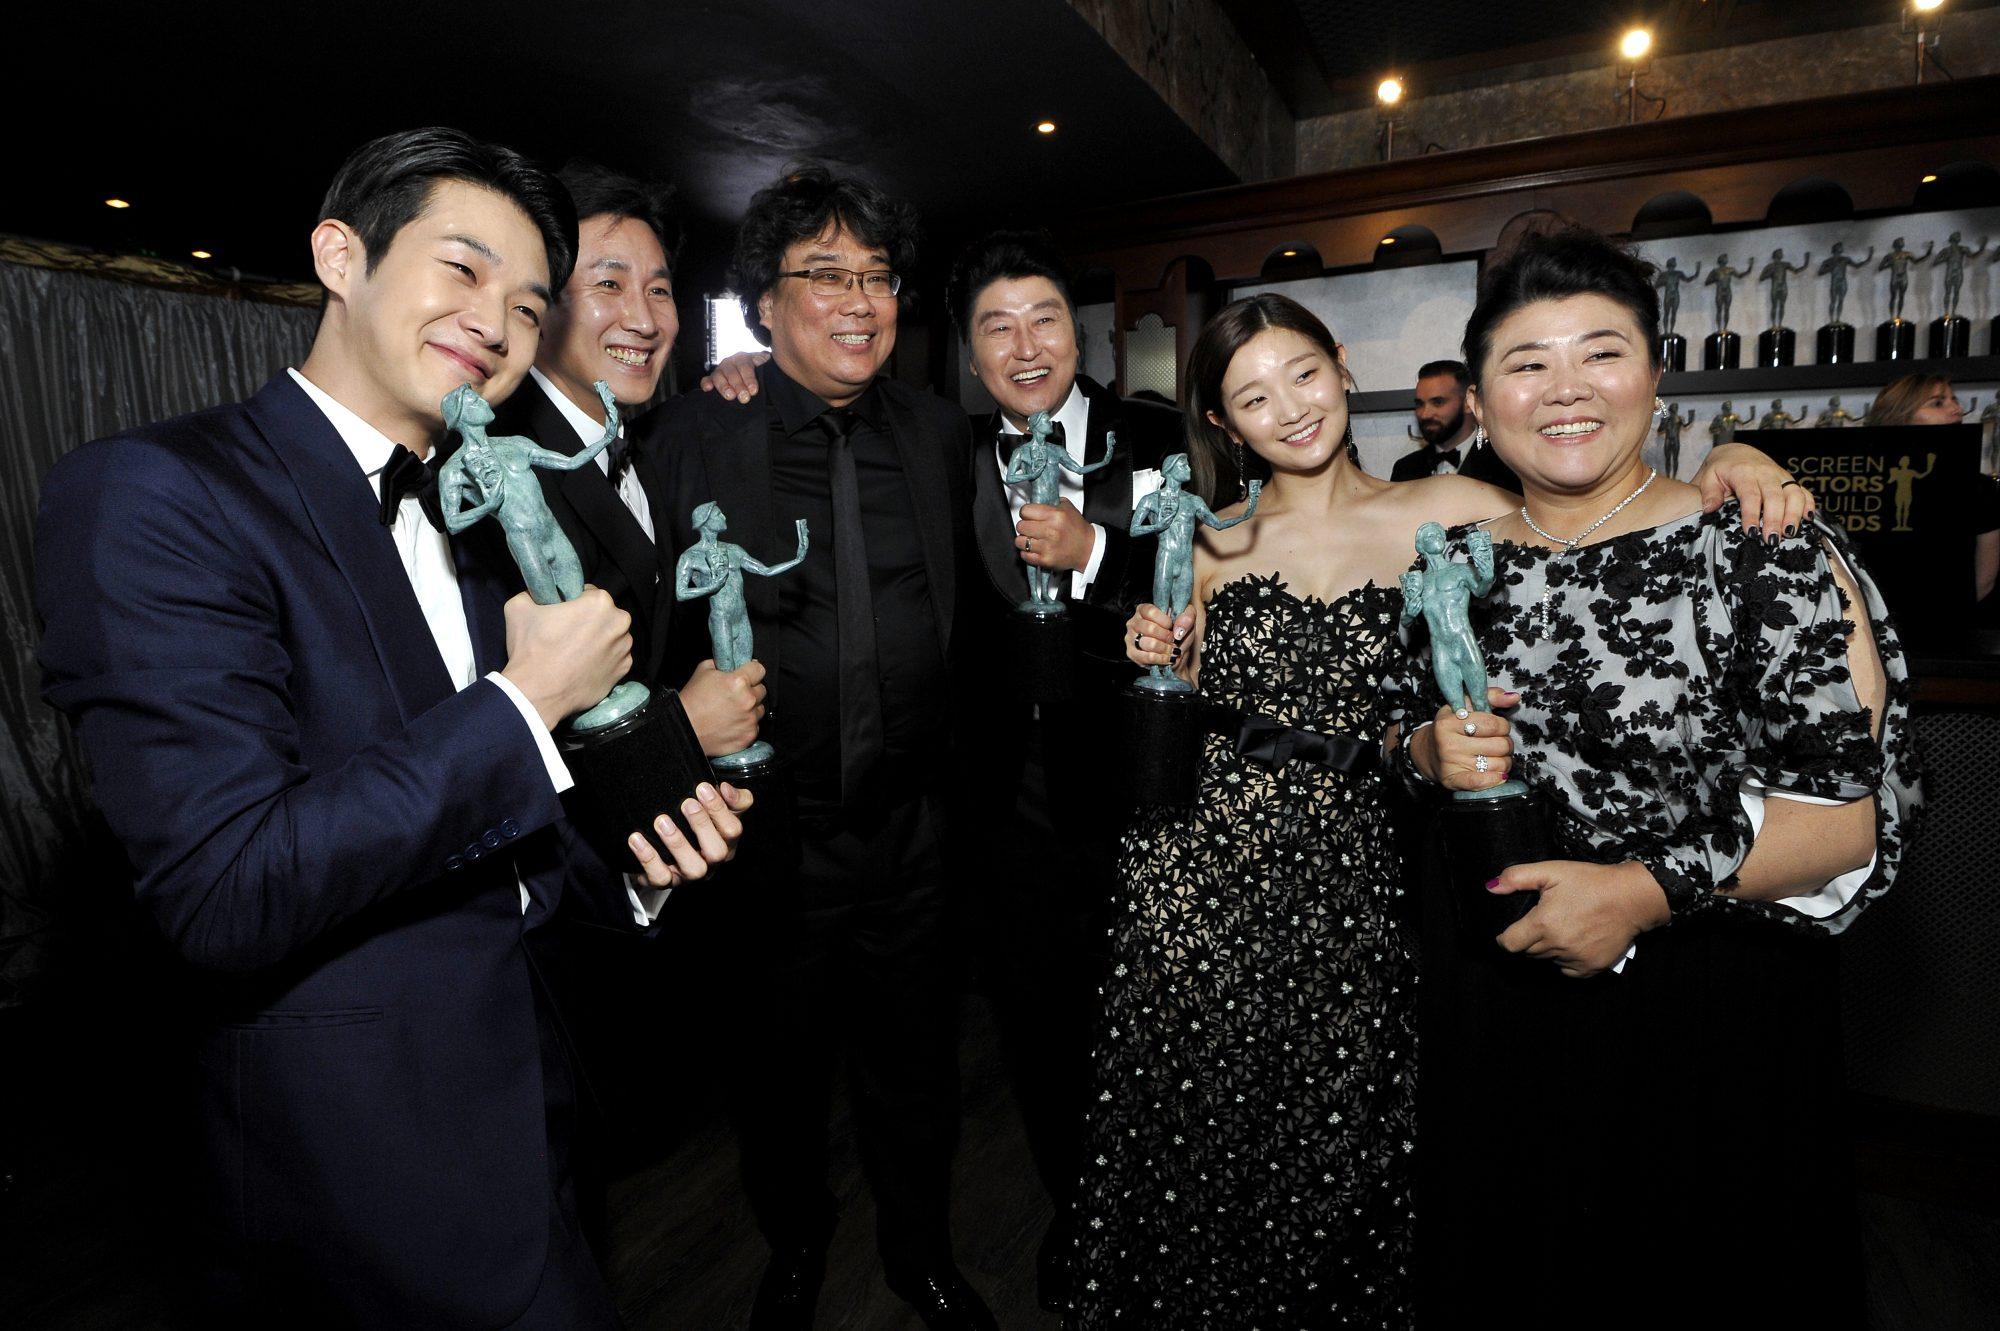 26th Annual Screen ActorsGuild Awards - Trophy Room